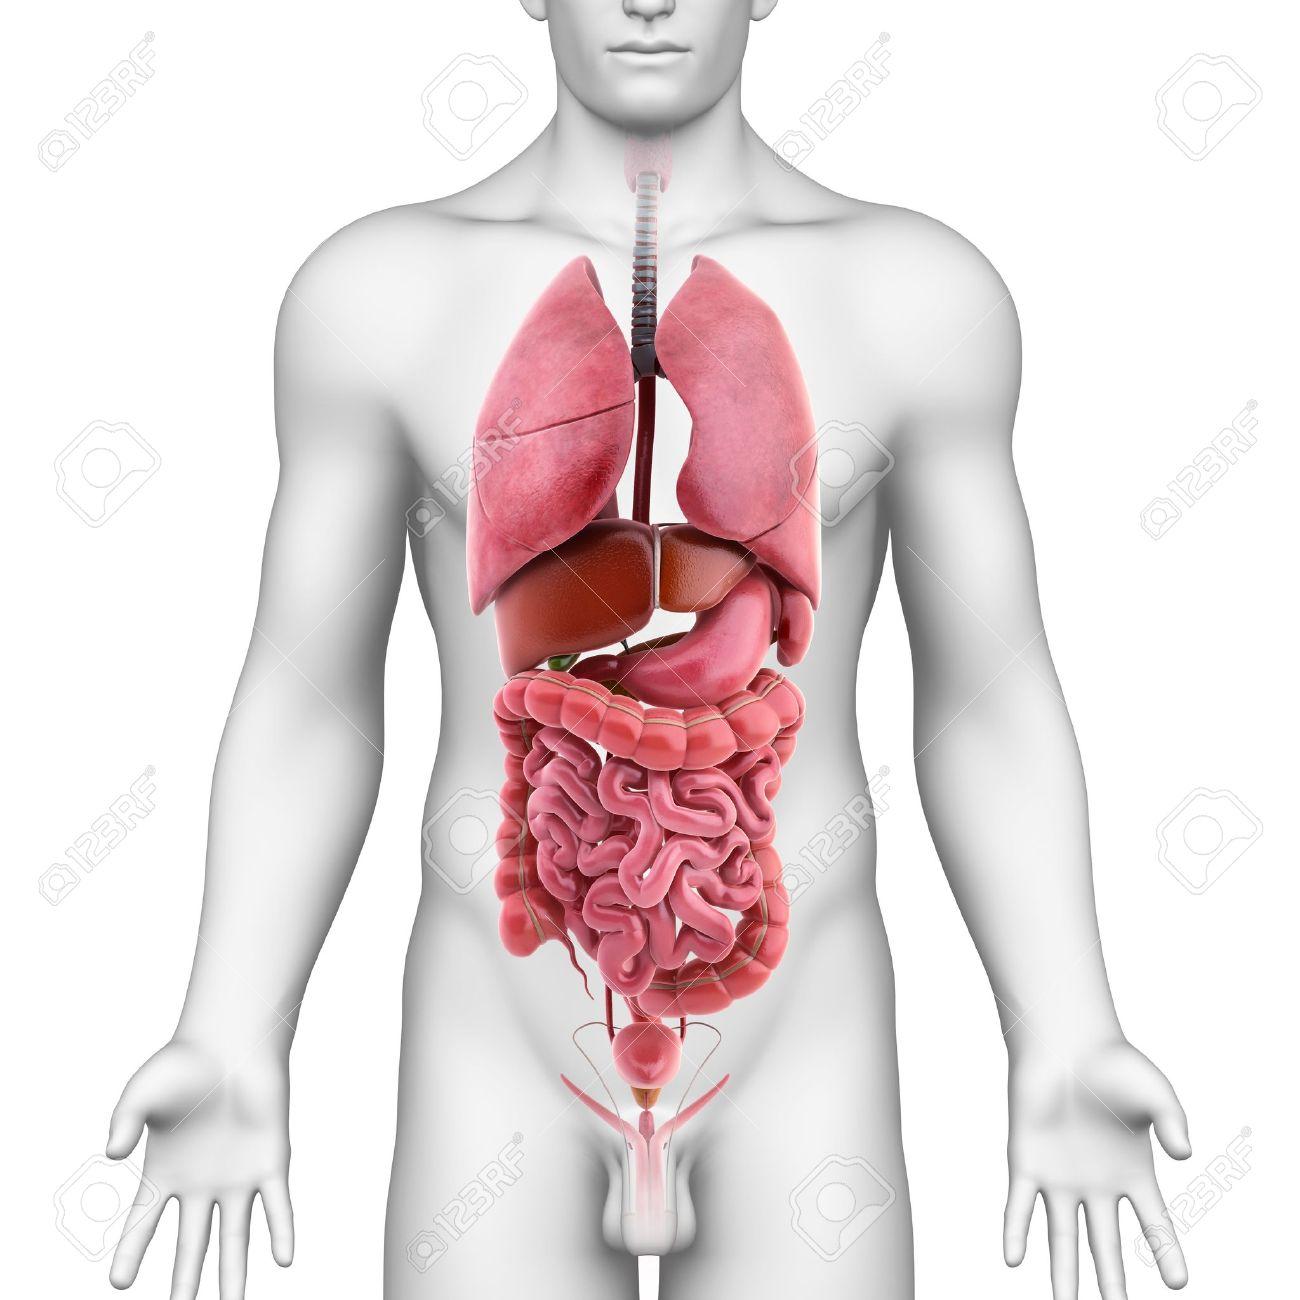 3d Illustration Of All Internal Organs Of Male Body 3d Illustration ...